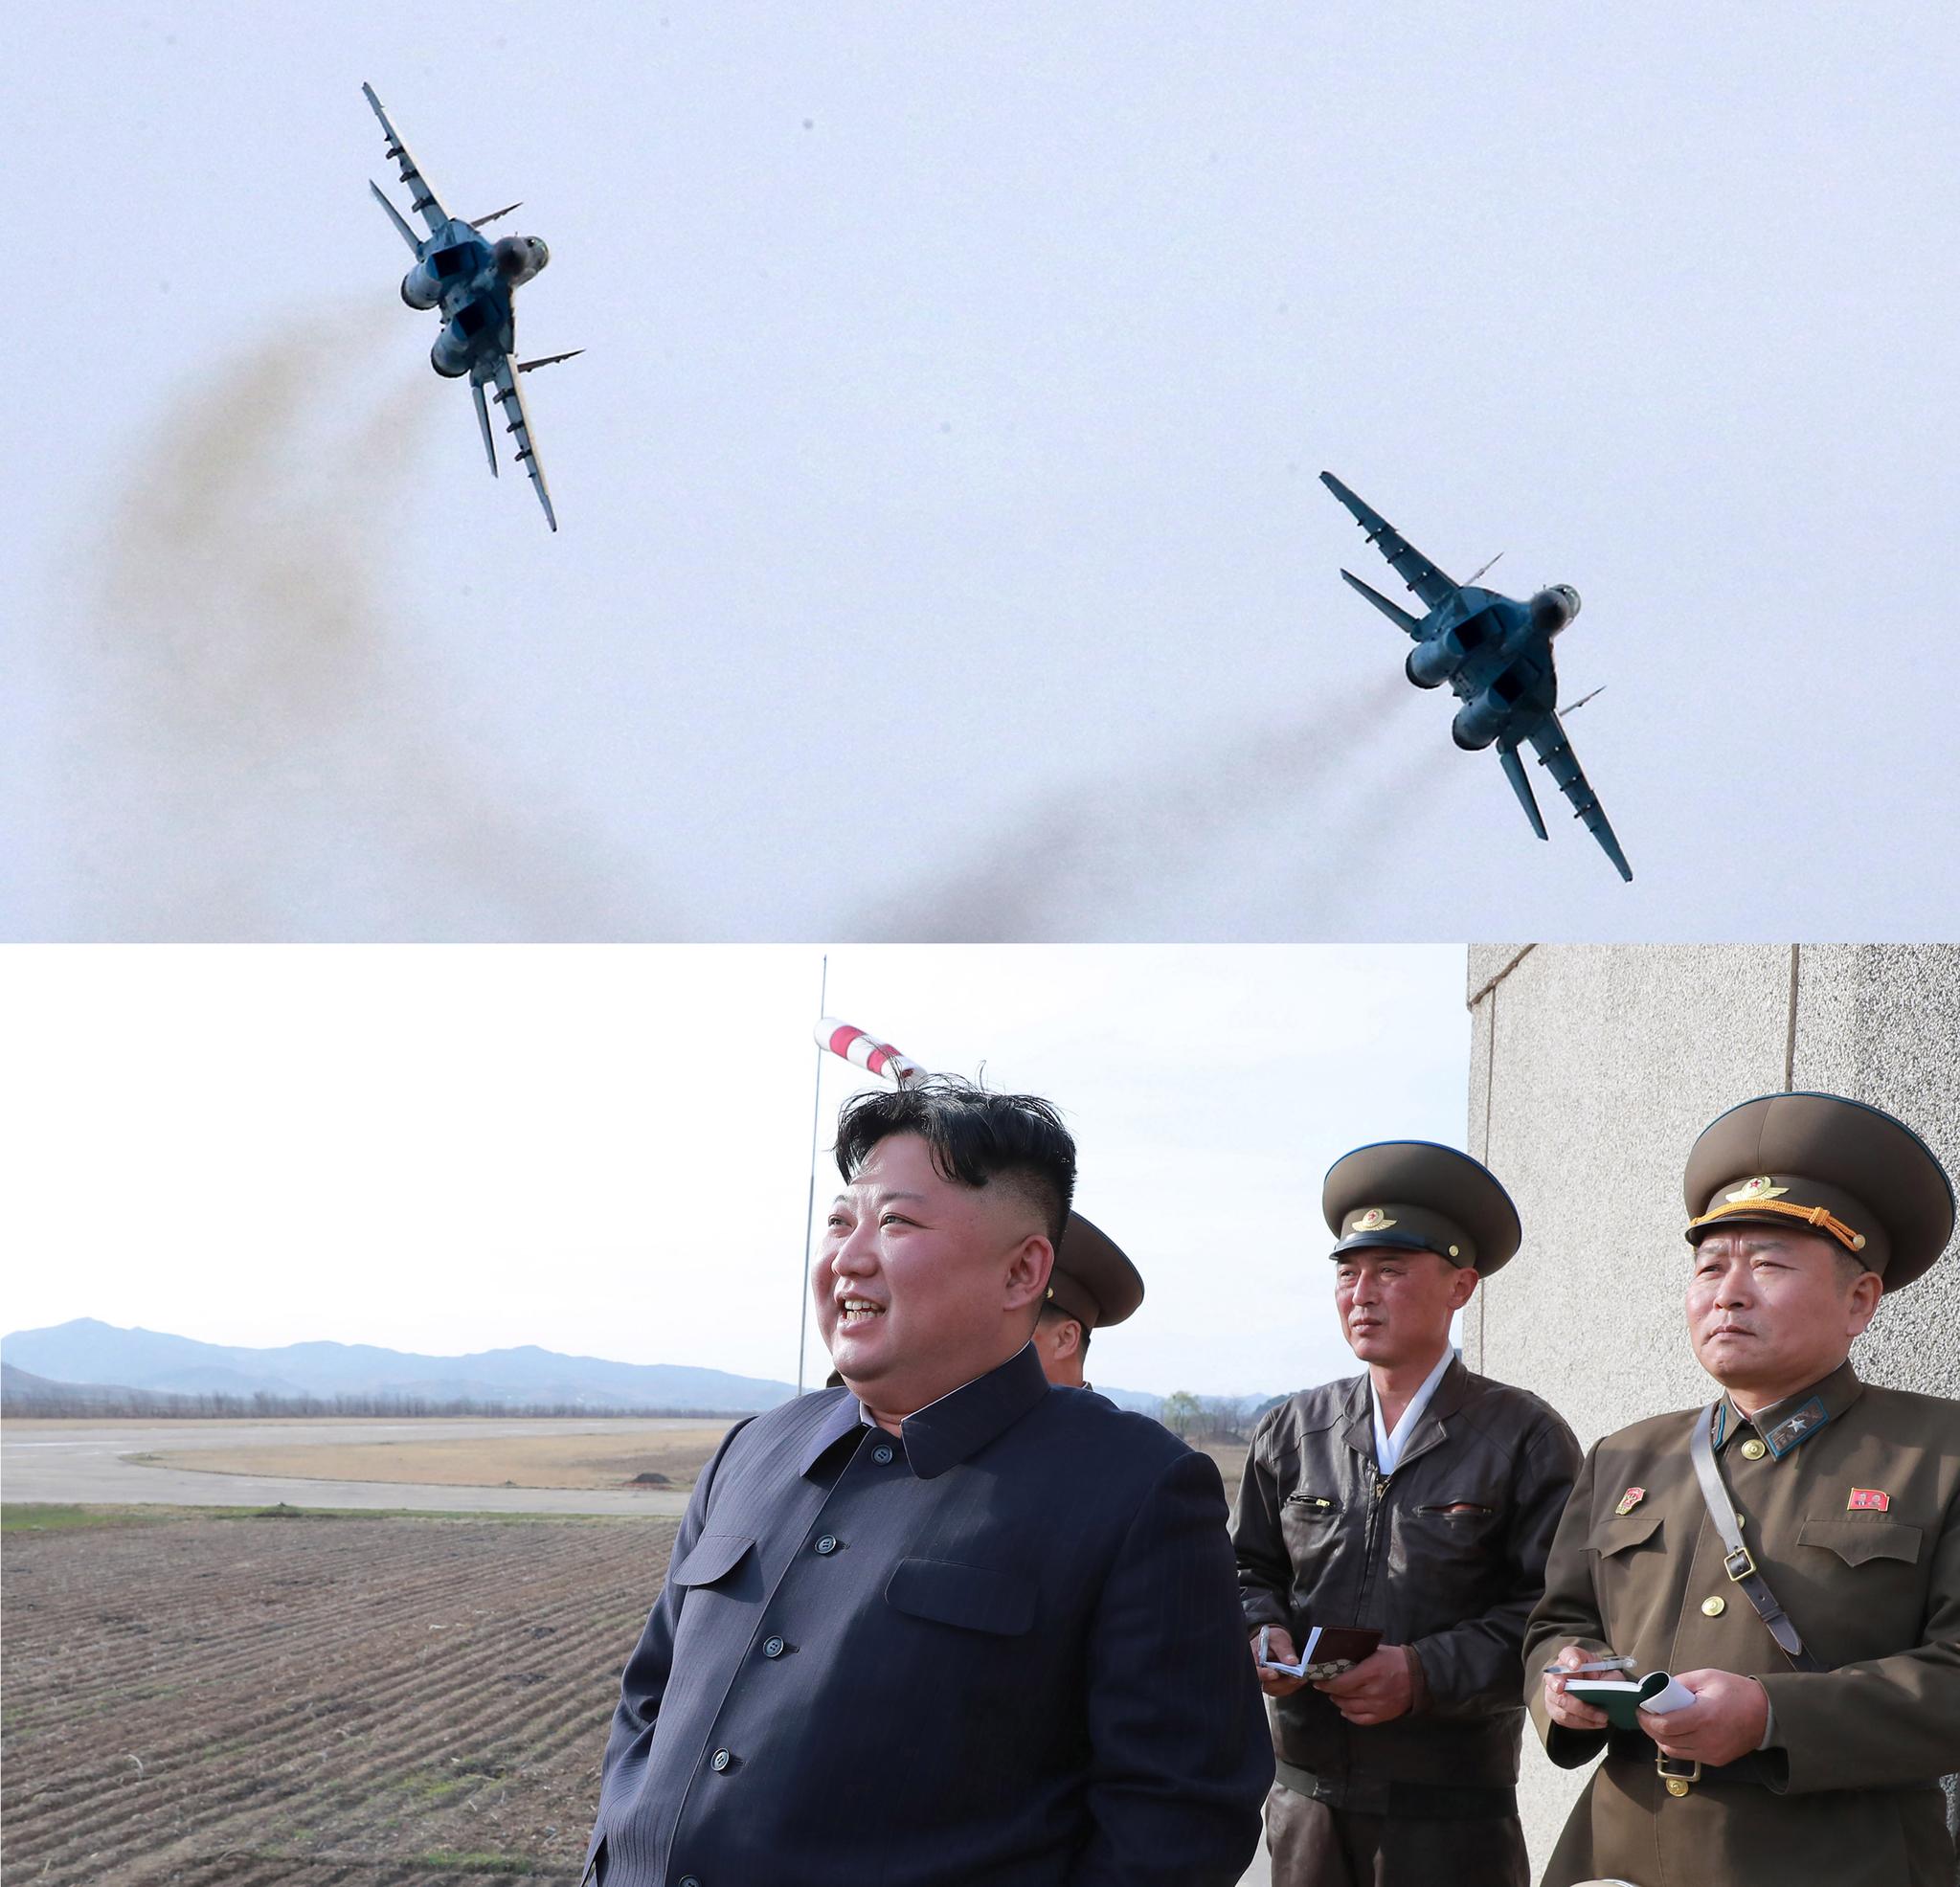 Korean People's Army: News - Page 6 44ee1891-4c10-4f0b-a902-d4a784d5a3a3